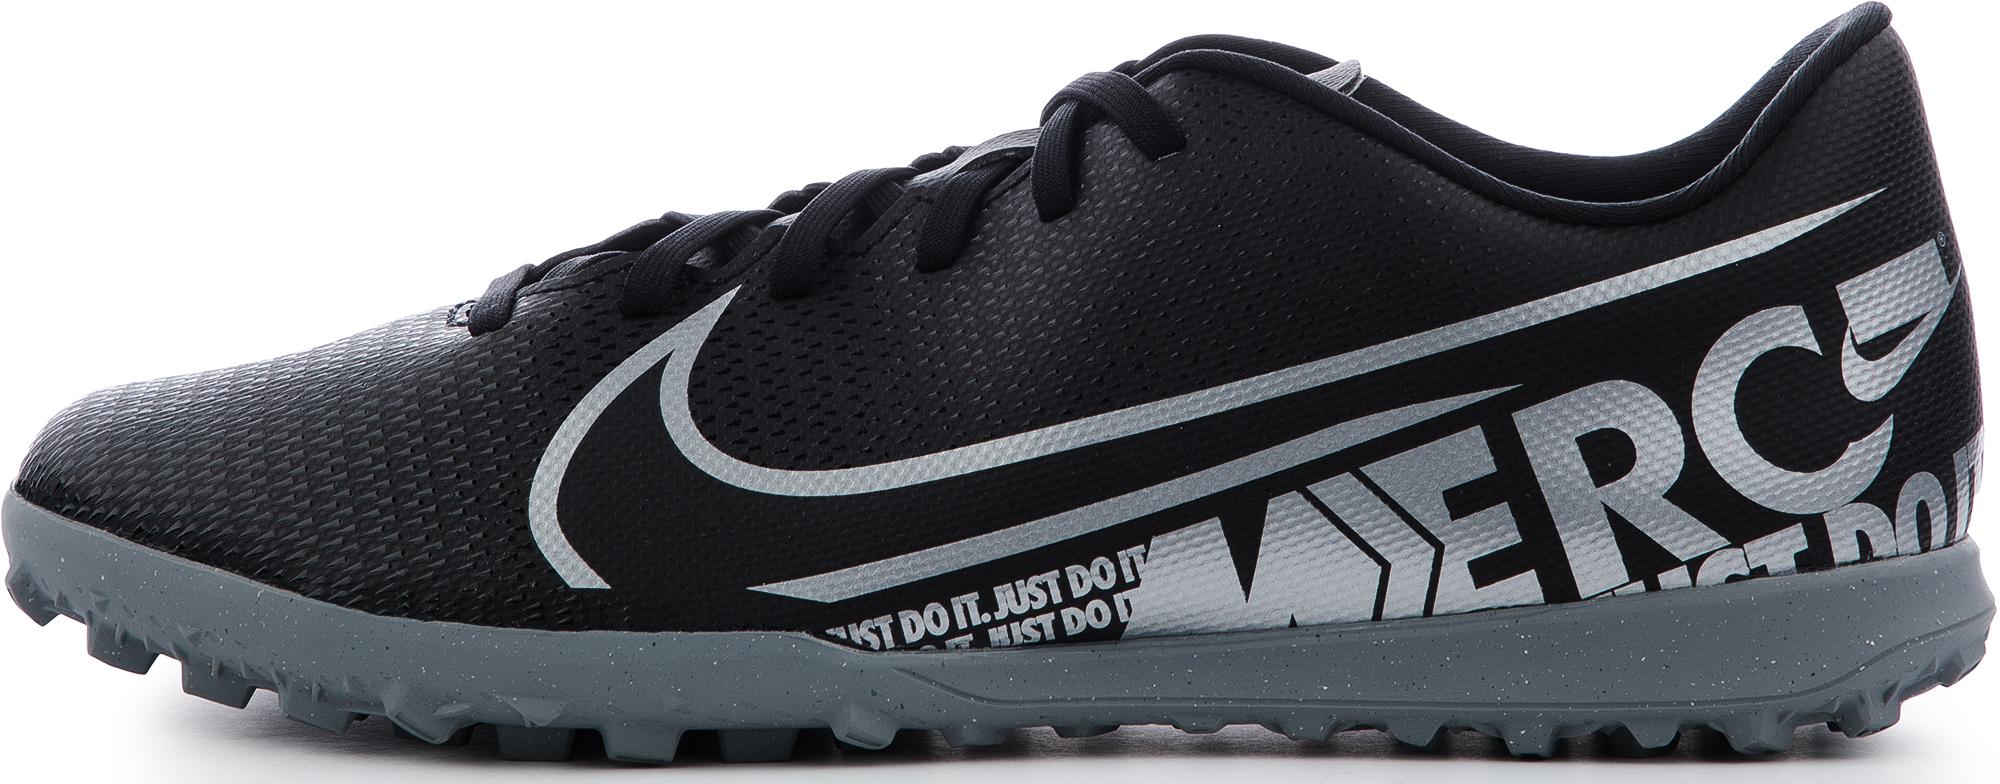 Nike Бутсы мужские Nike Mercurial Vapor 13 Club TF, размер 40 цена 2017